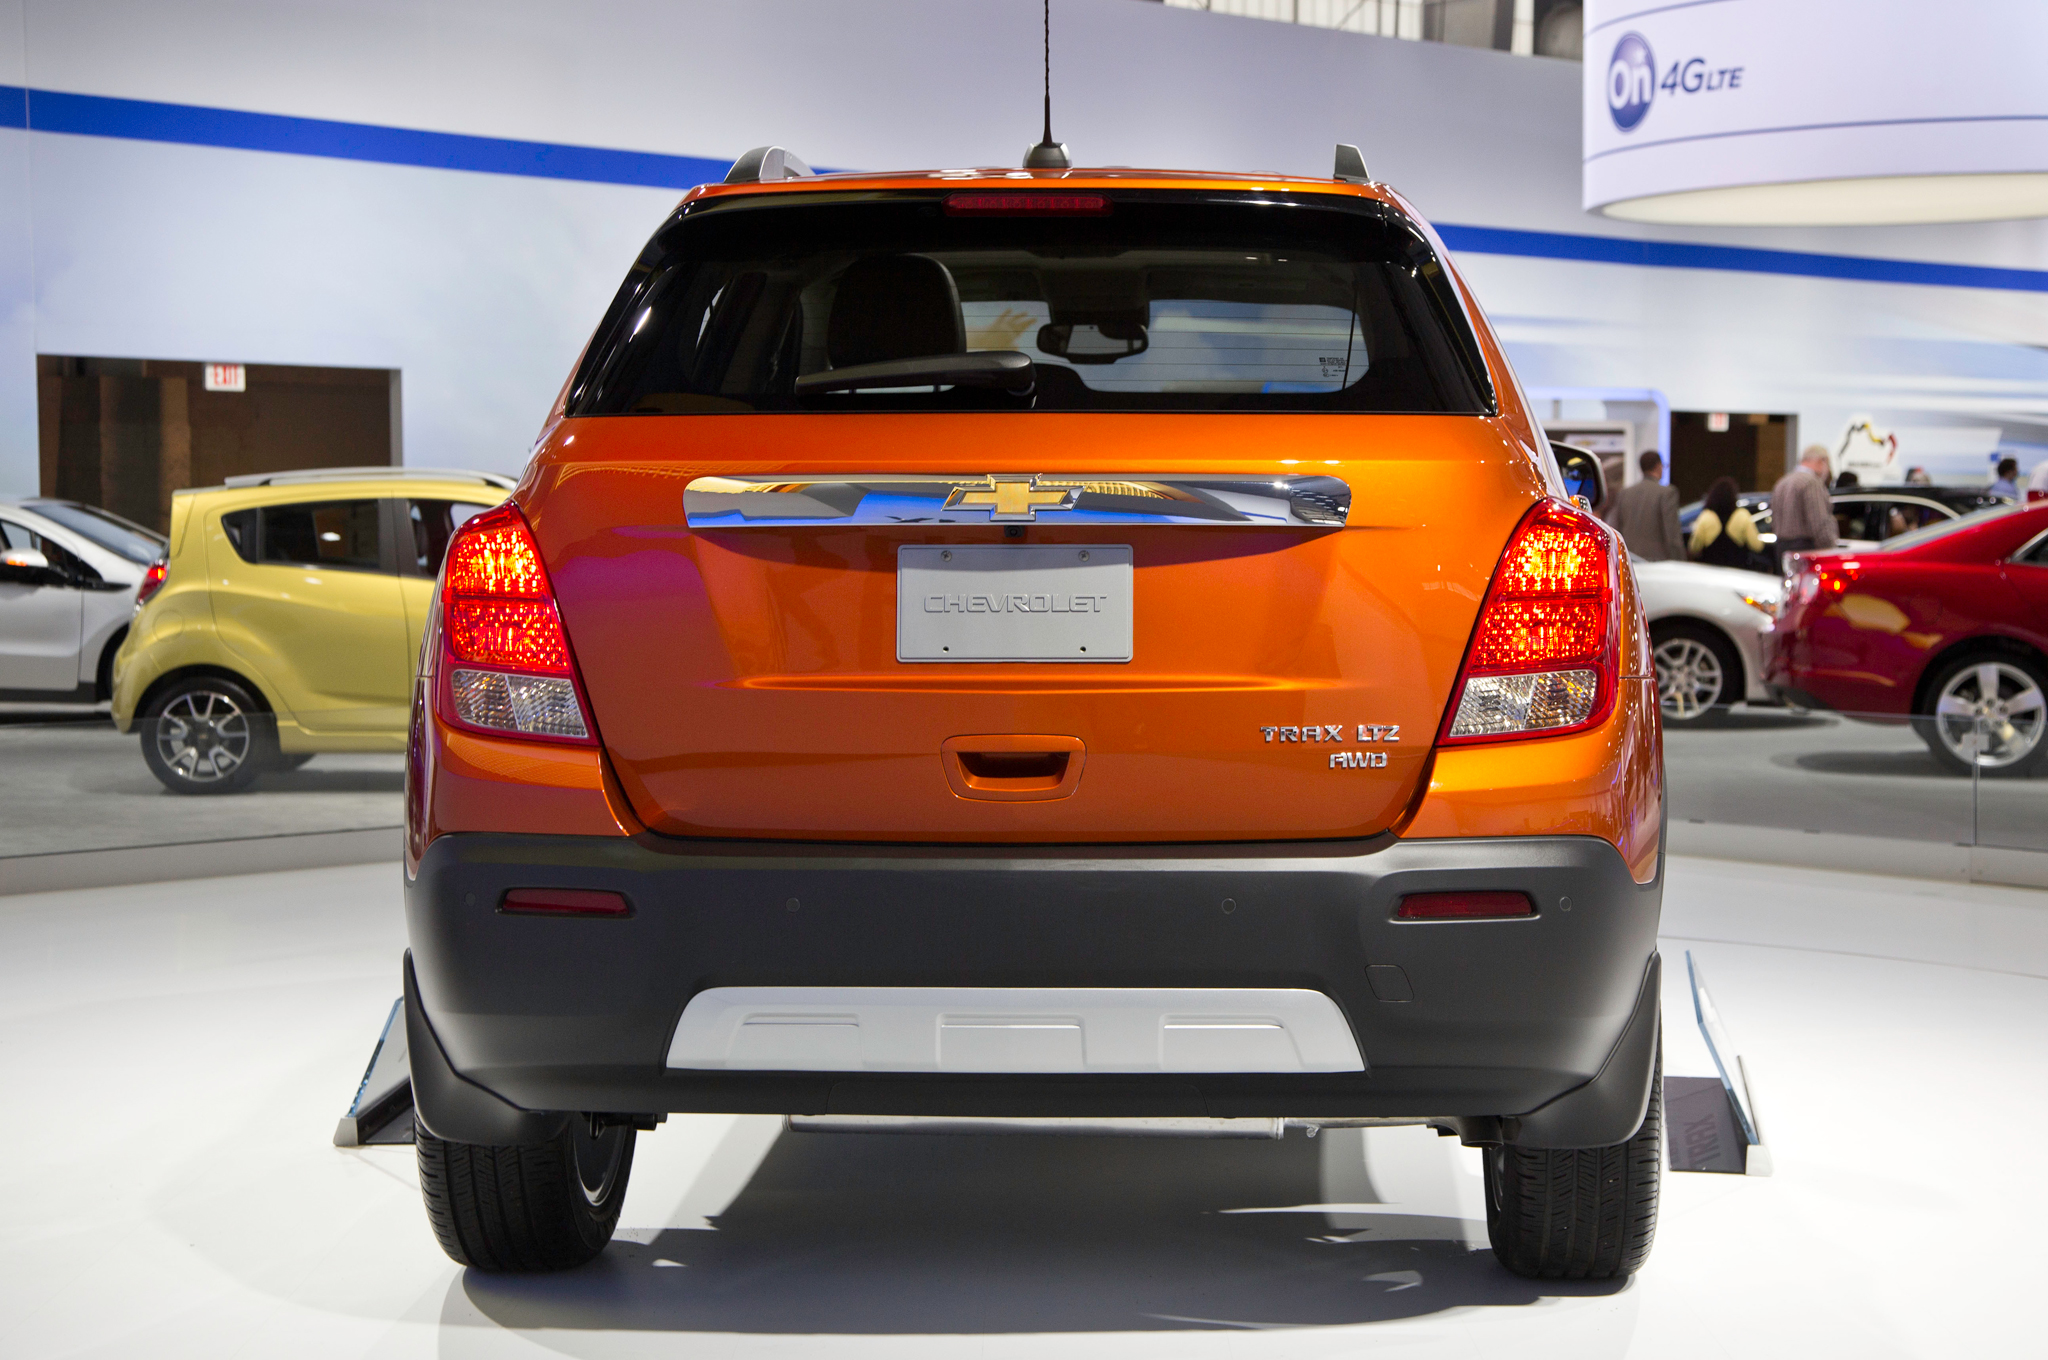 2015 Chevrolet Trax Rear Design